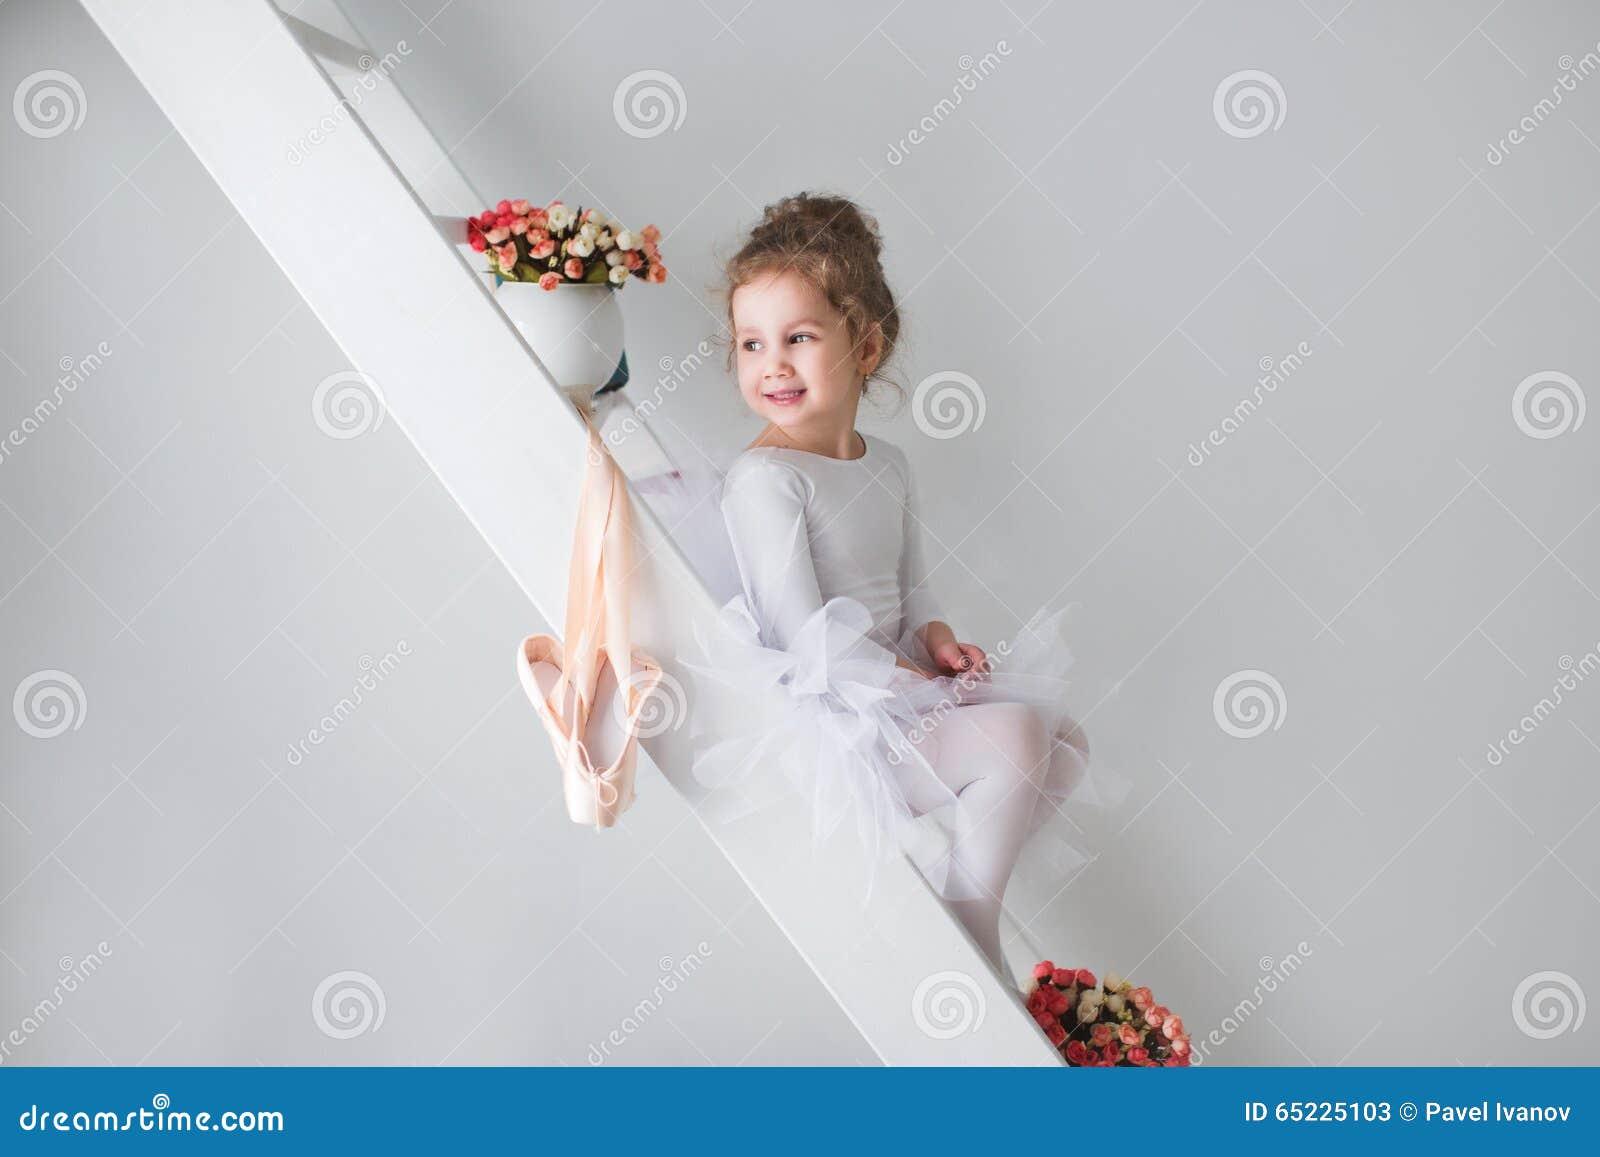 Petite jeune ballerine adorable dans une humeur espiègle